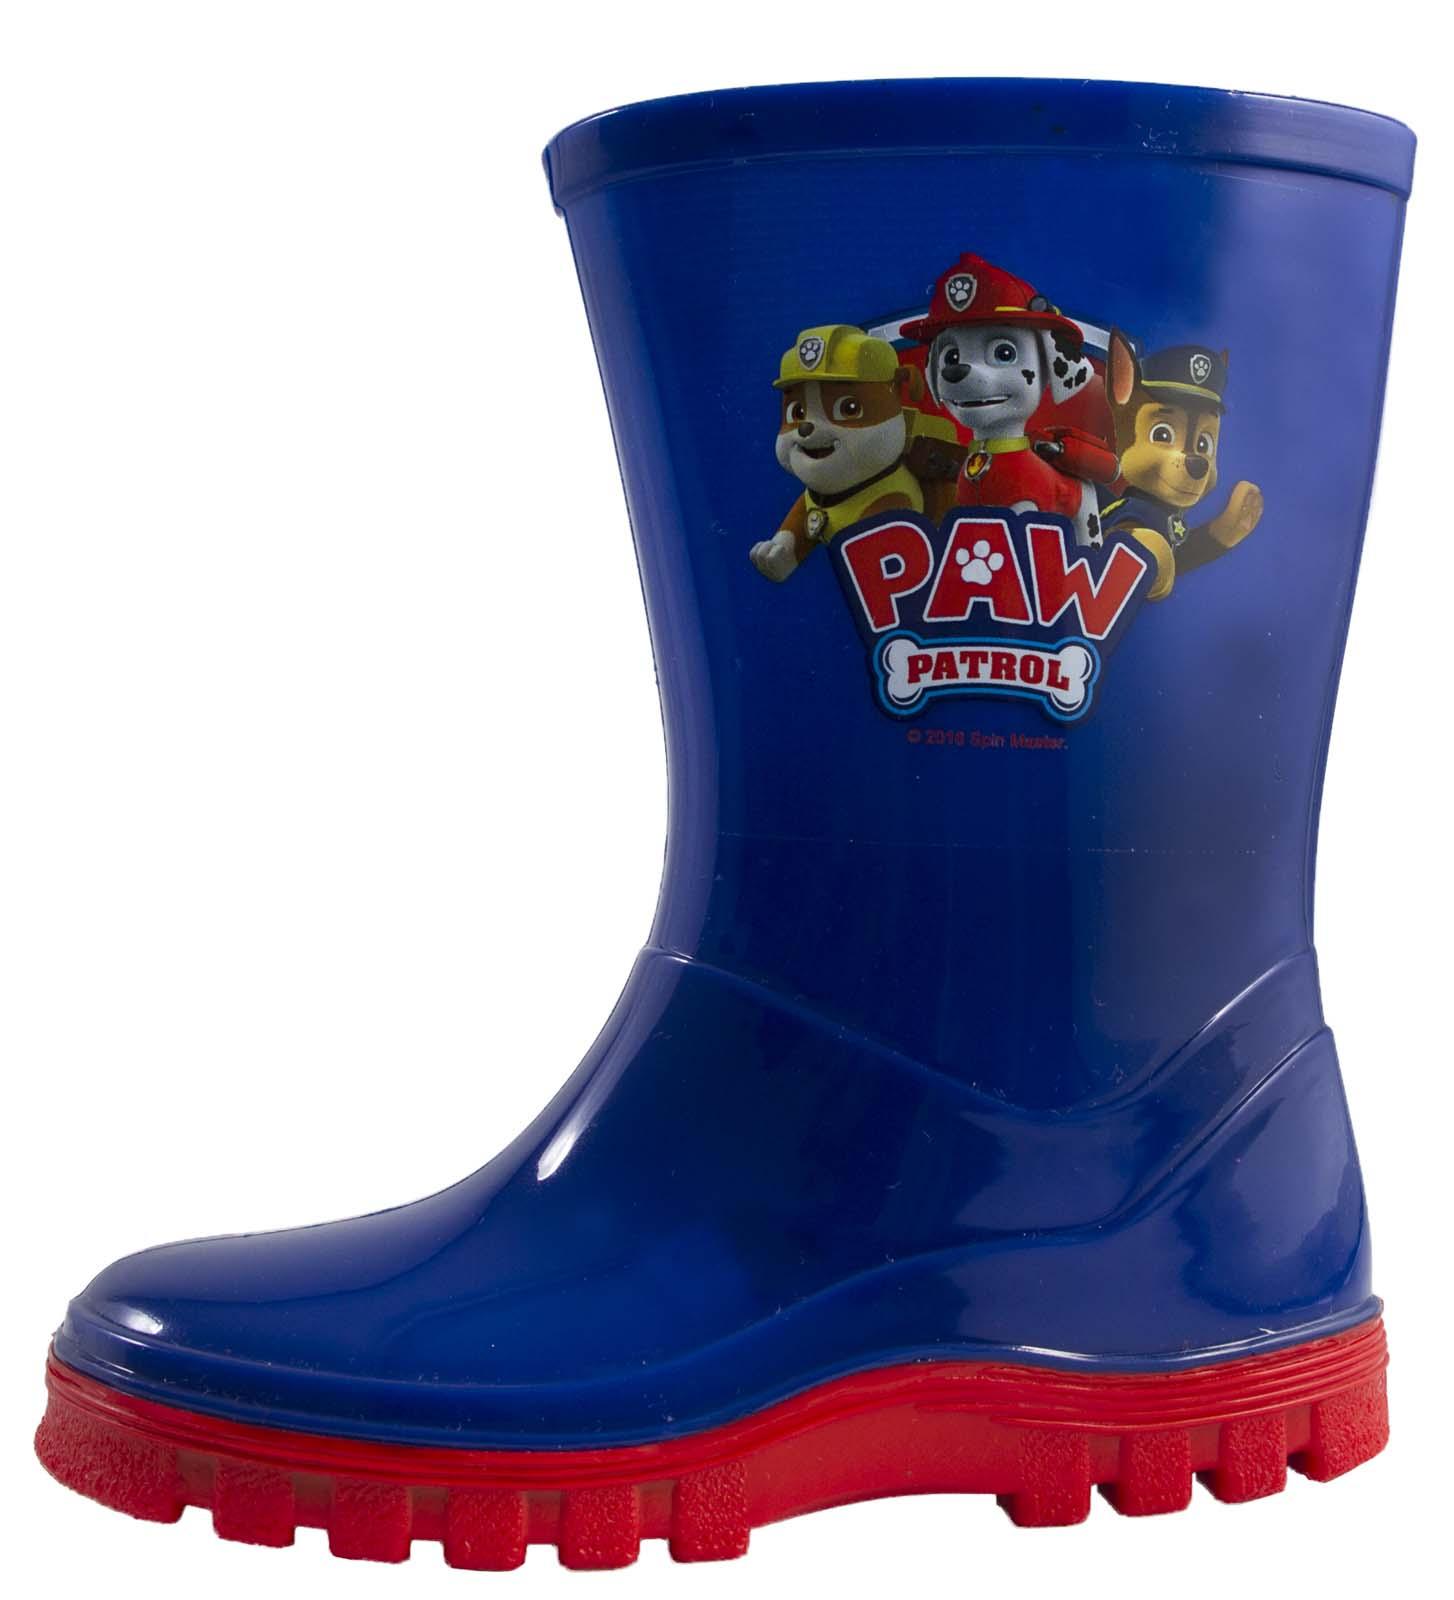 Paw Patrol Wellington Botas De Lluvia Botas De Agua Niños Niñas Nieve Mitad de Pantorrilla Botas Talla